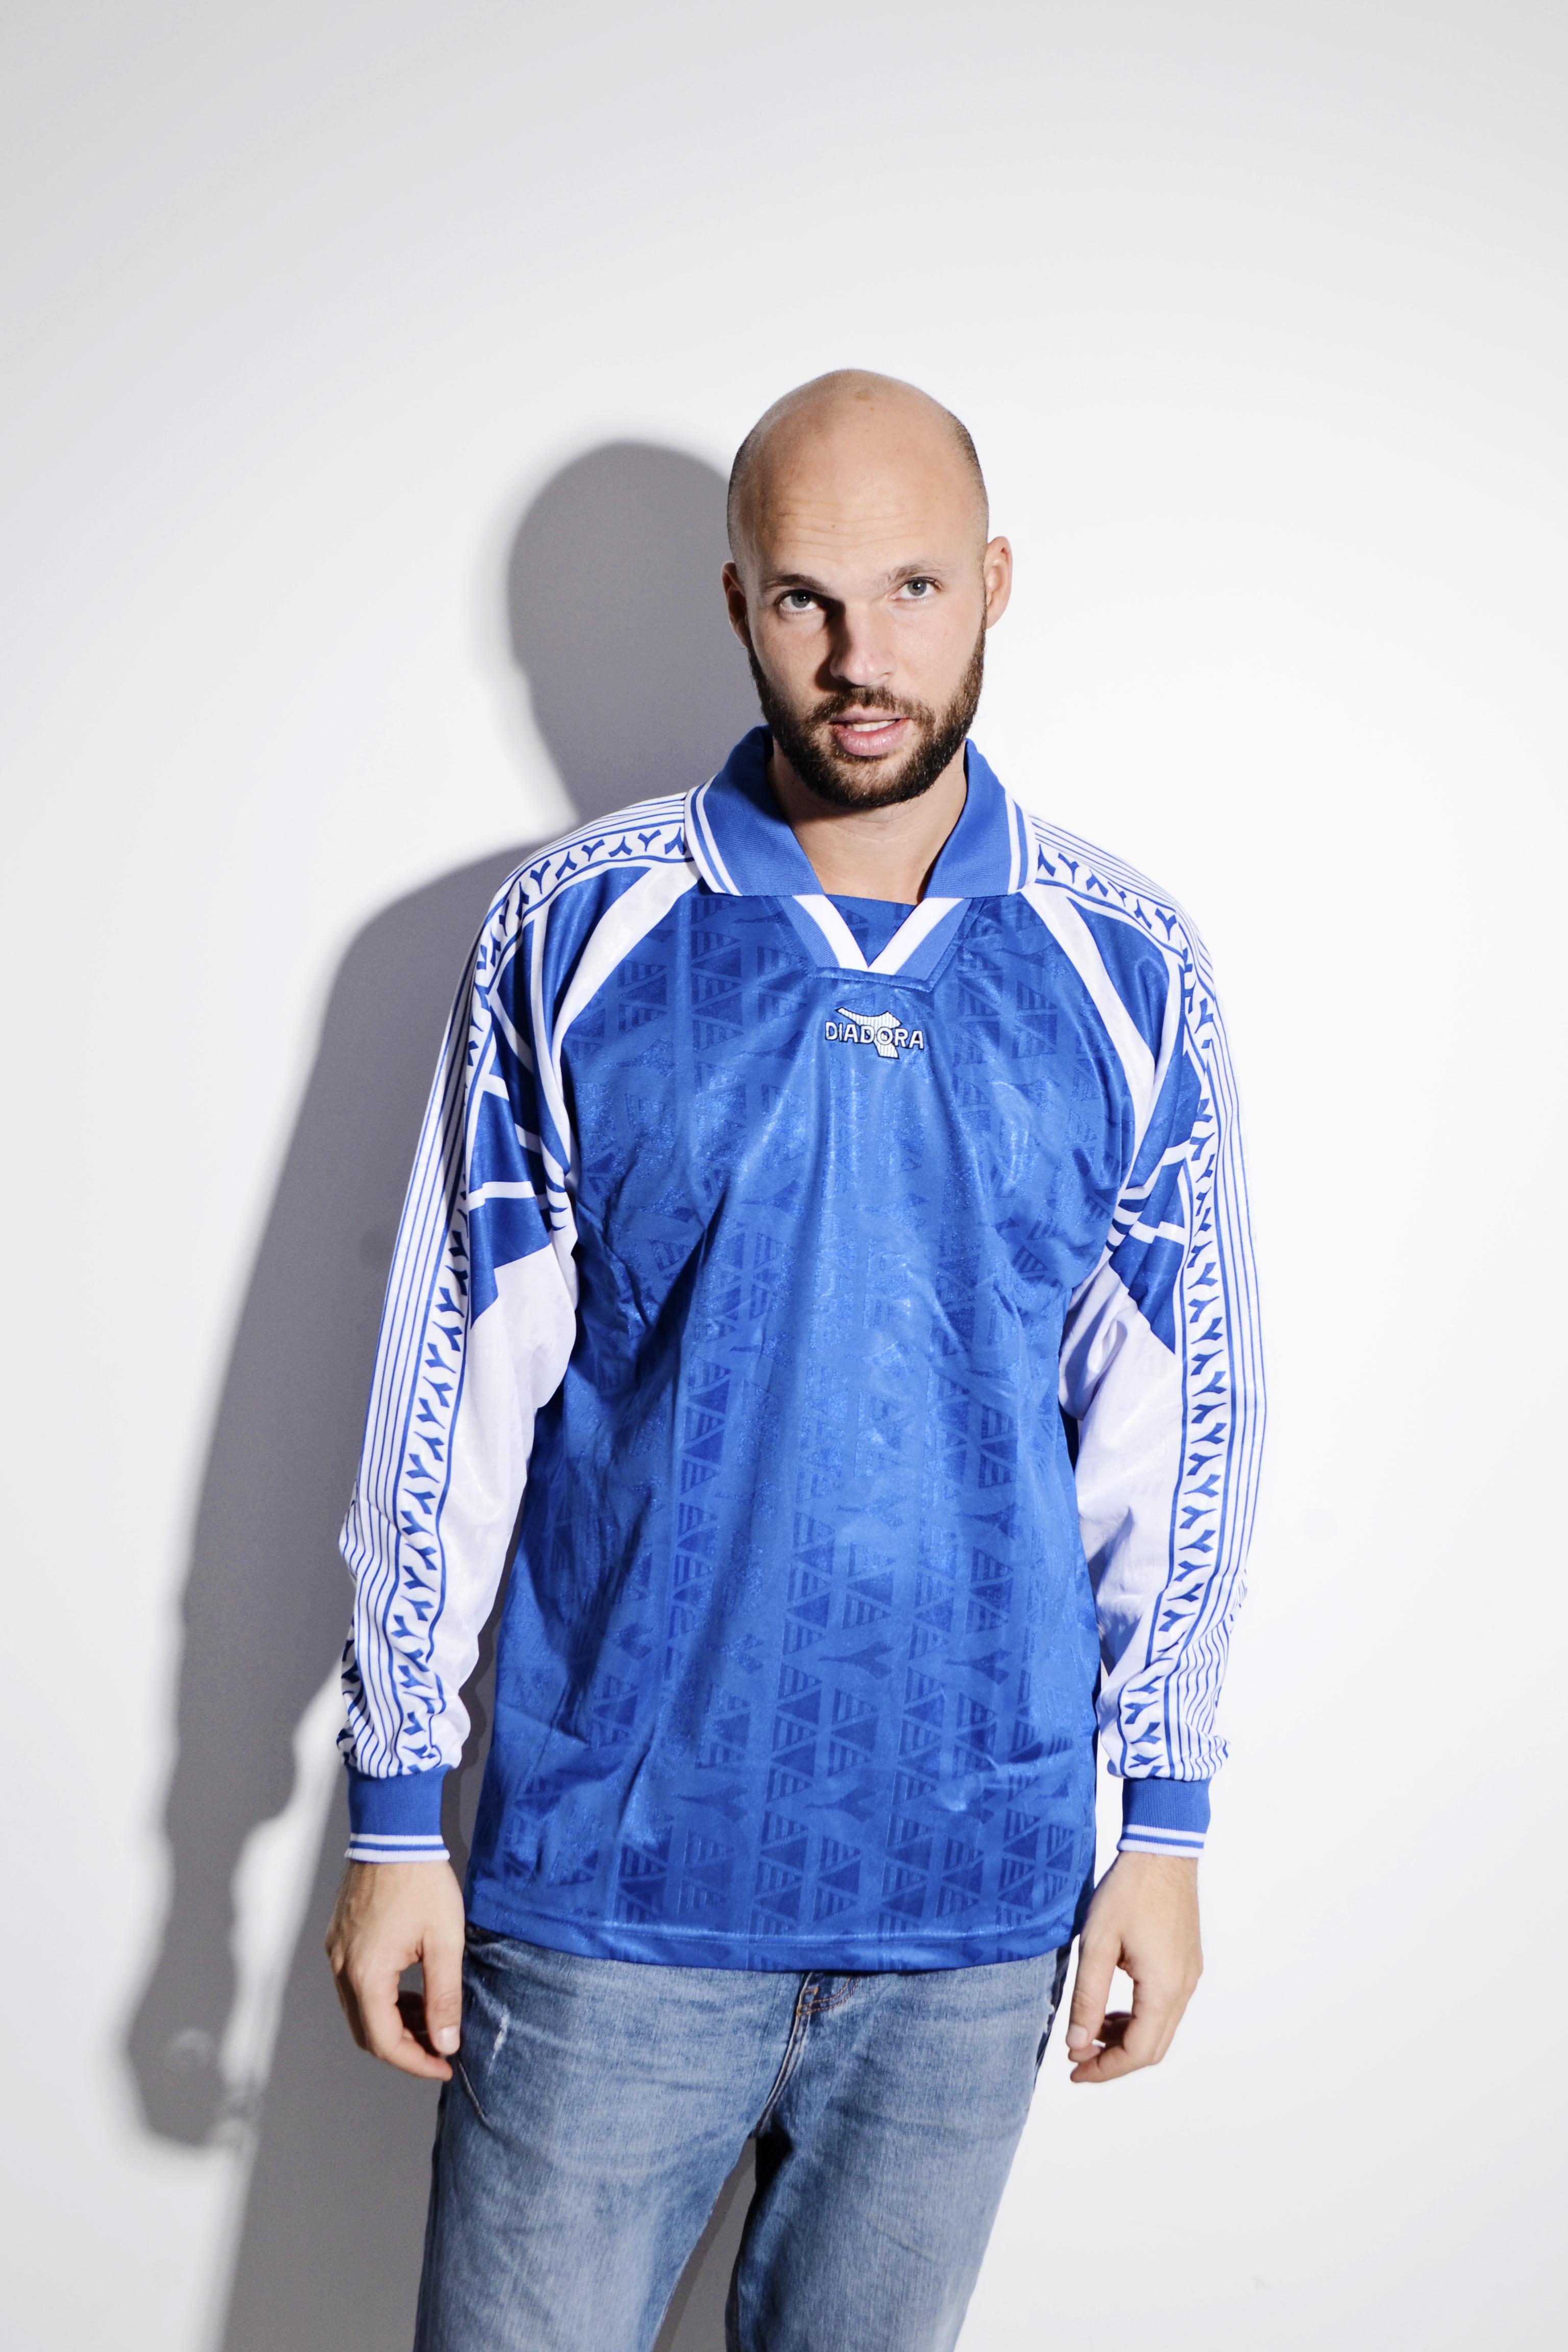 f391a957ec DIADORA football blue shirt for men   Soccer team training sports rugby  polo long sleeves shirt top   90s streetwear sport clothing   Large